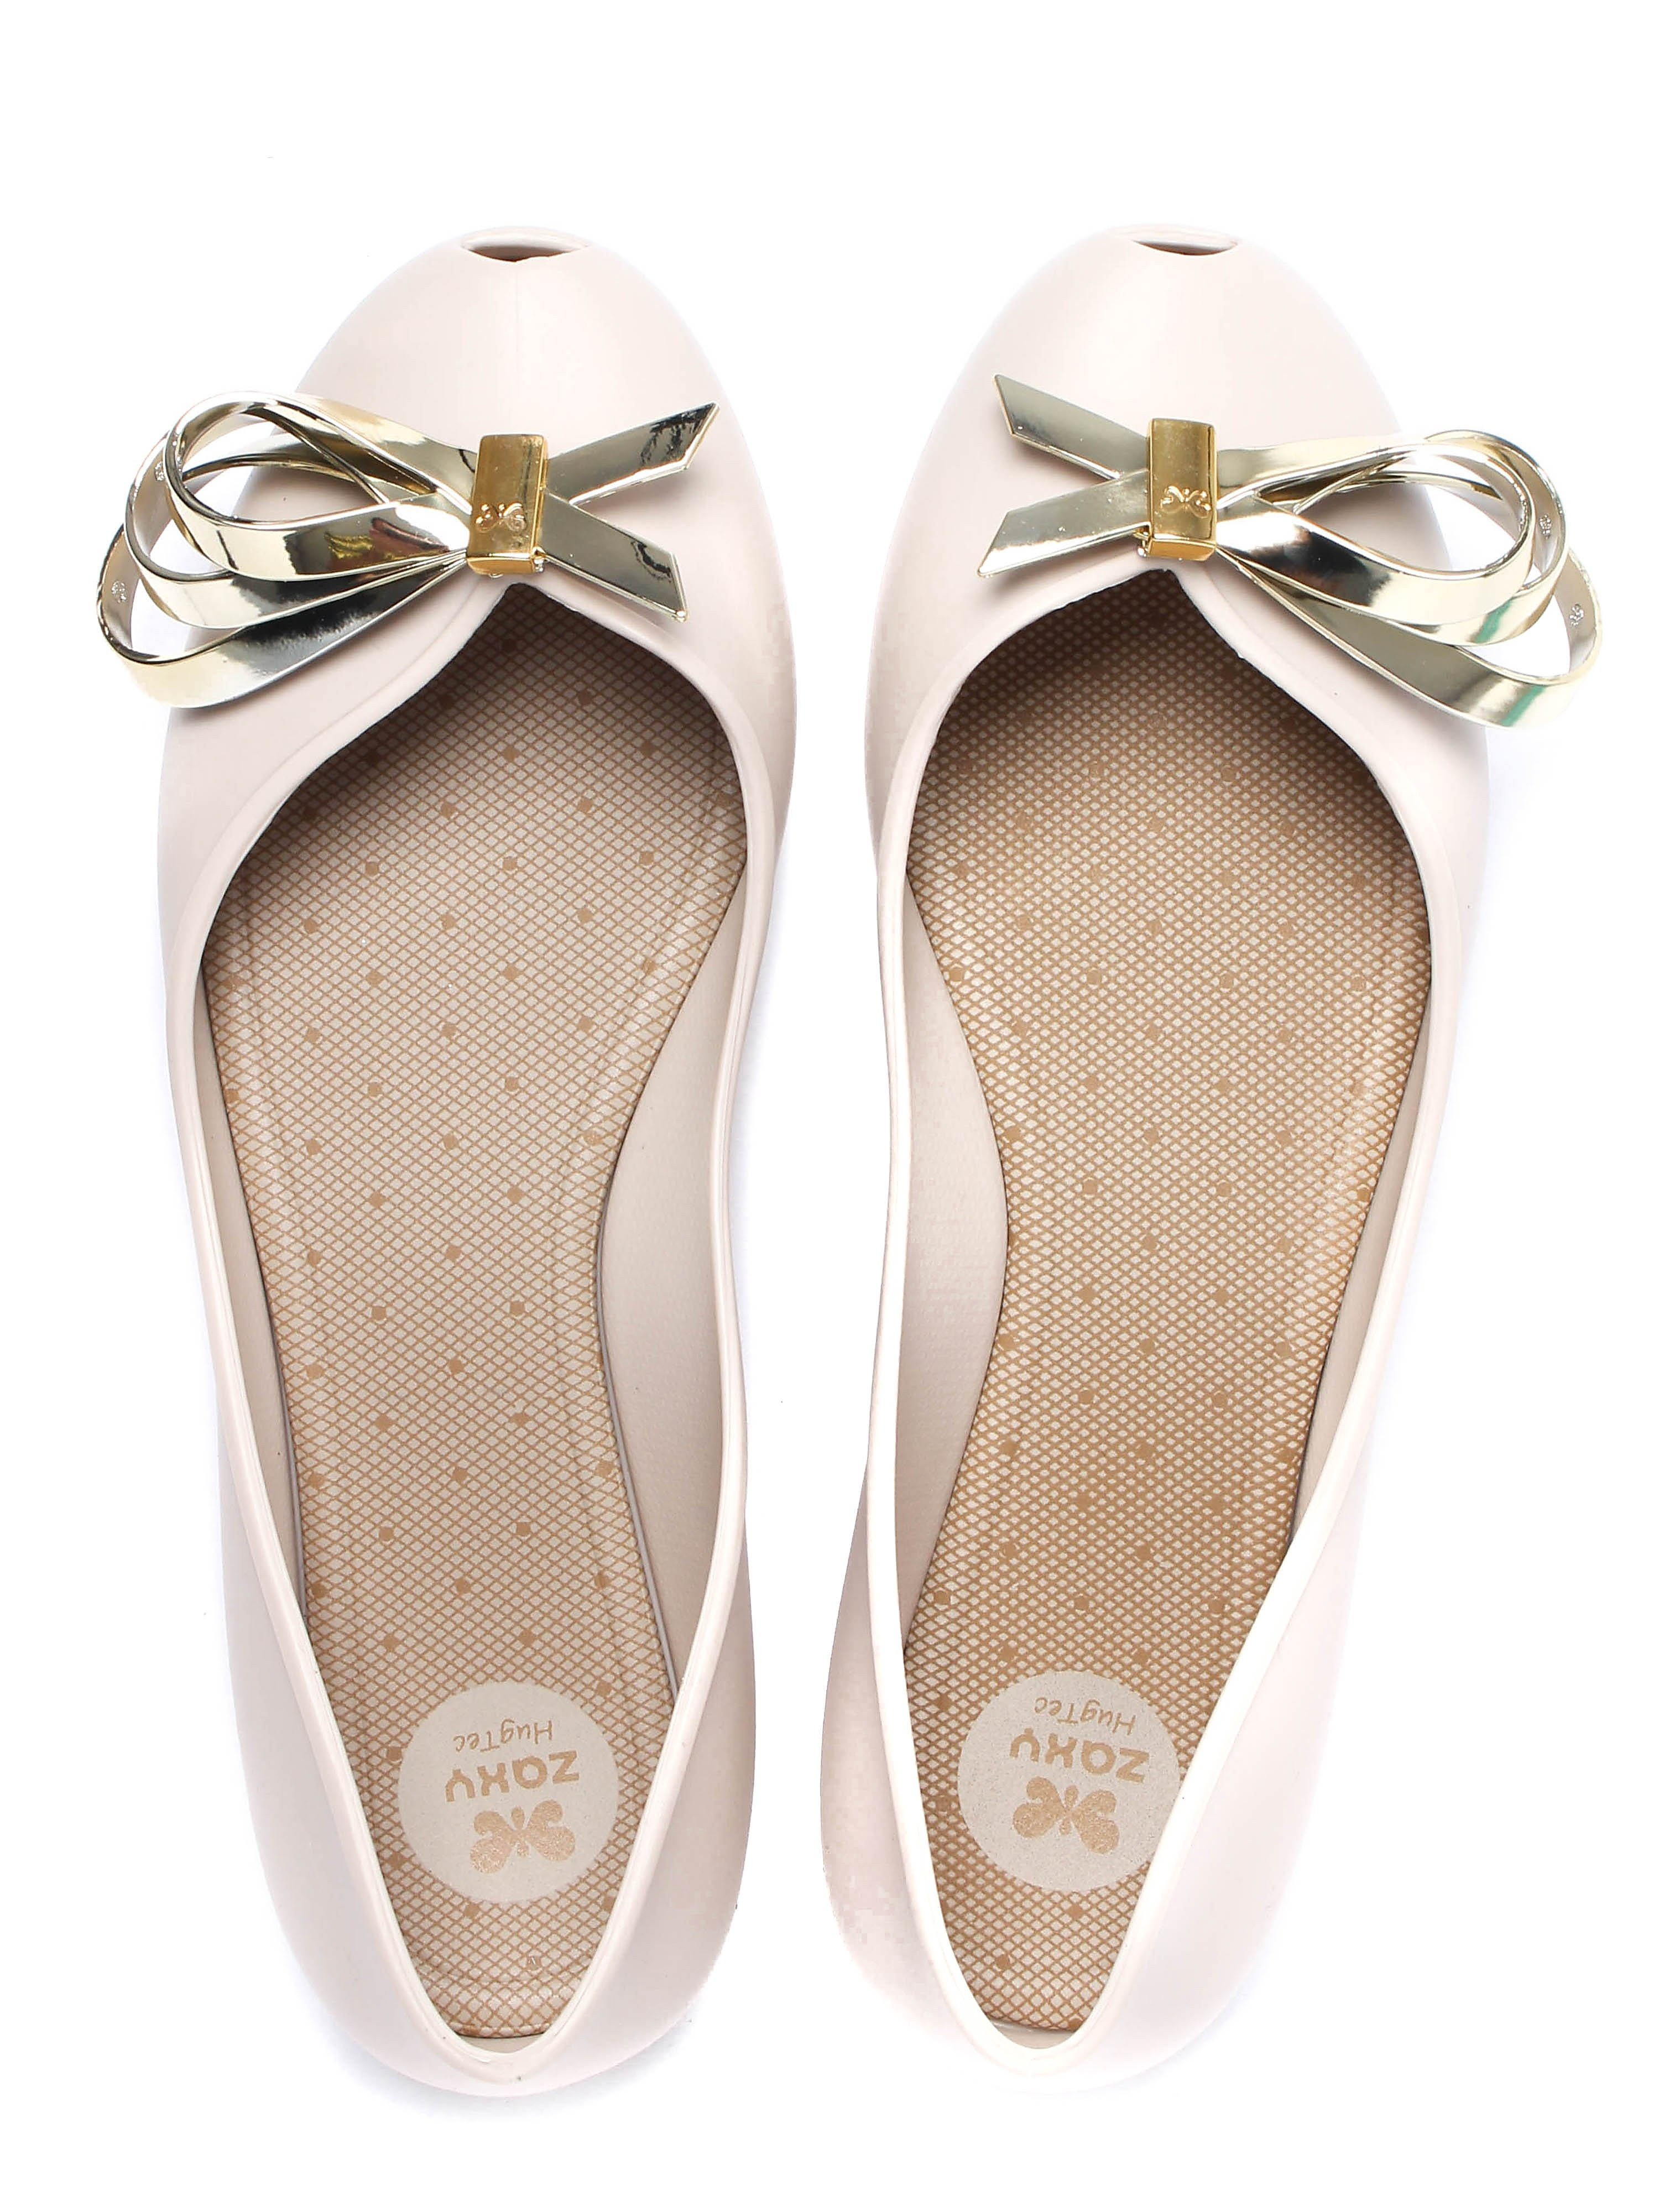 Zaxy Women's Luxury Ribbon Ballerina Pumps - Ivory/Gold